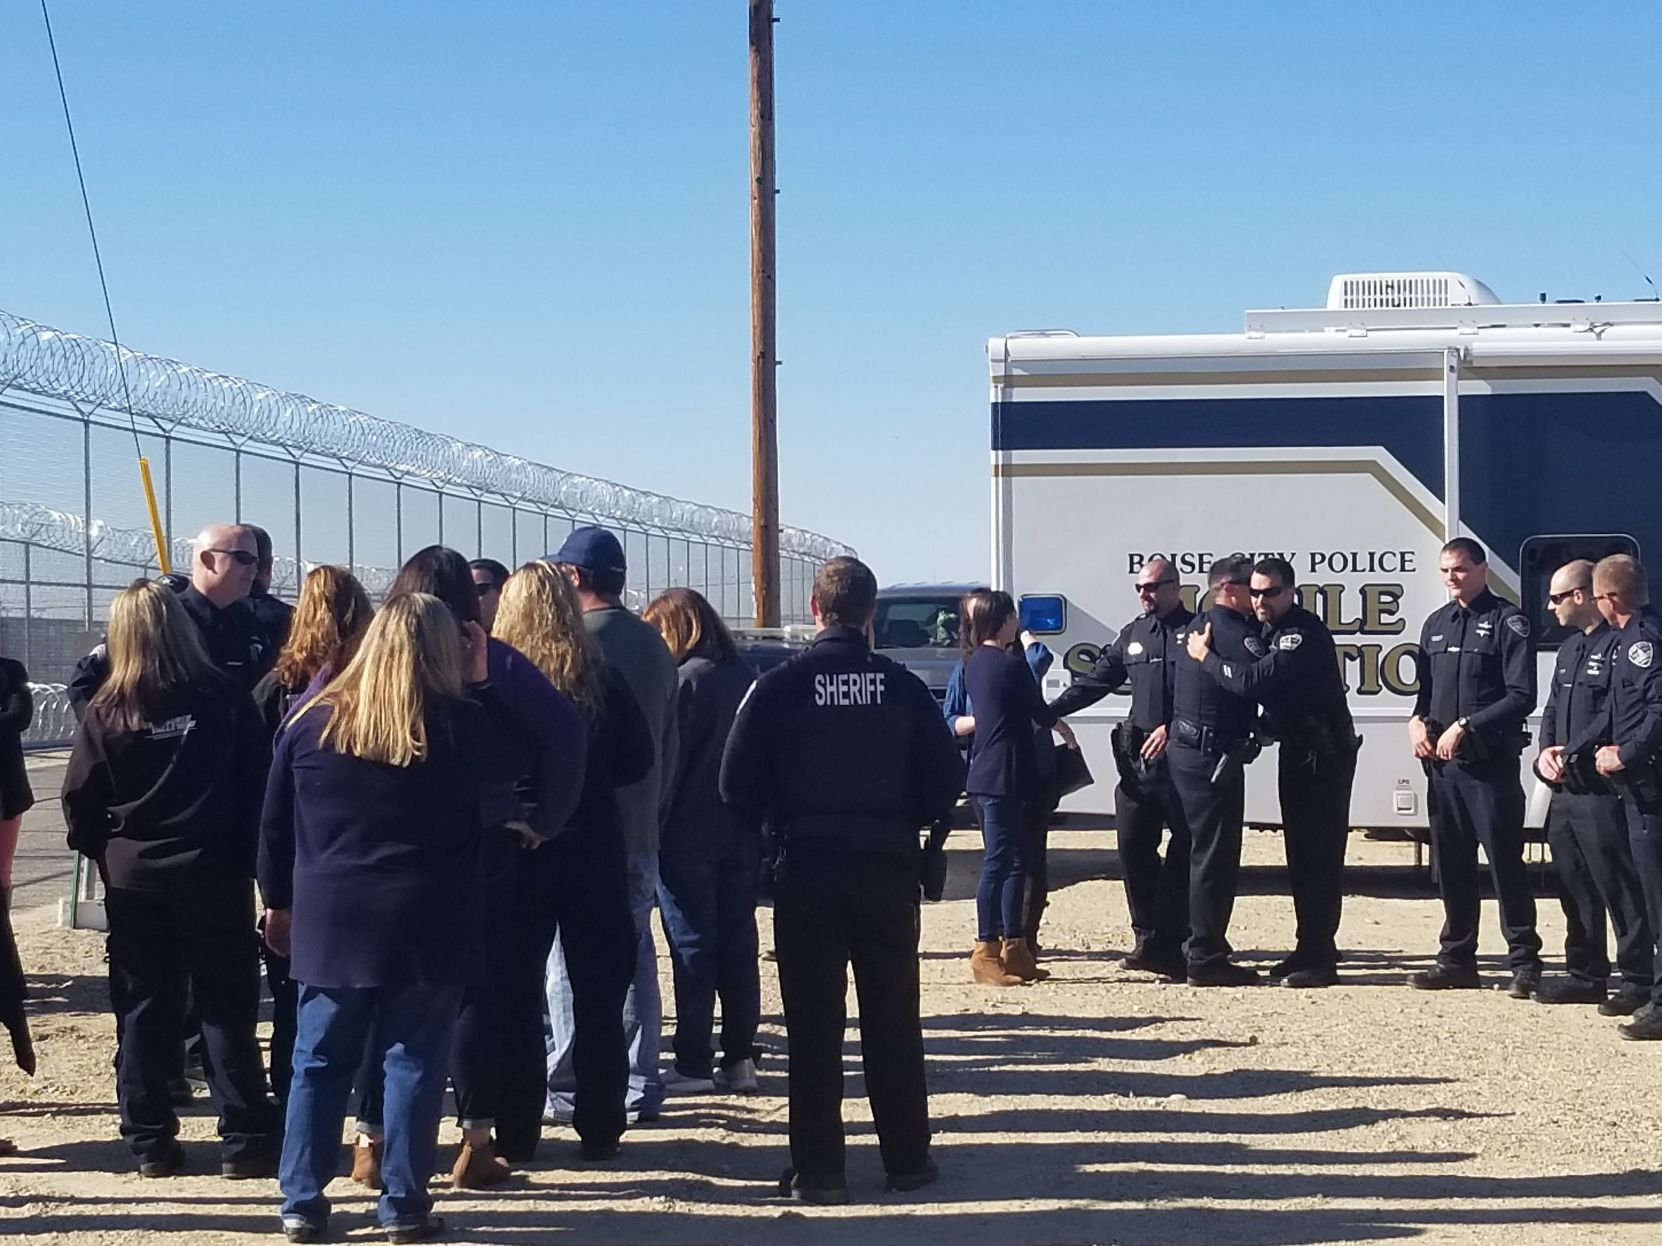 Man who fatally shot officer at 14 years old denied parole | Idaho Press